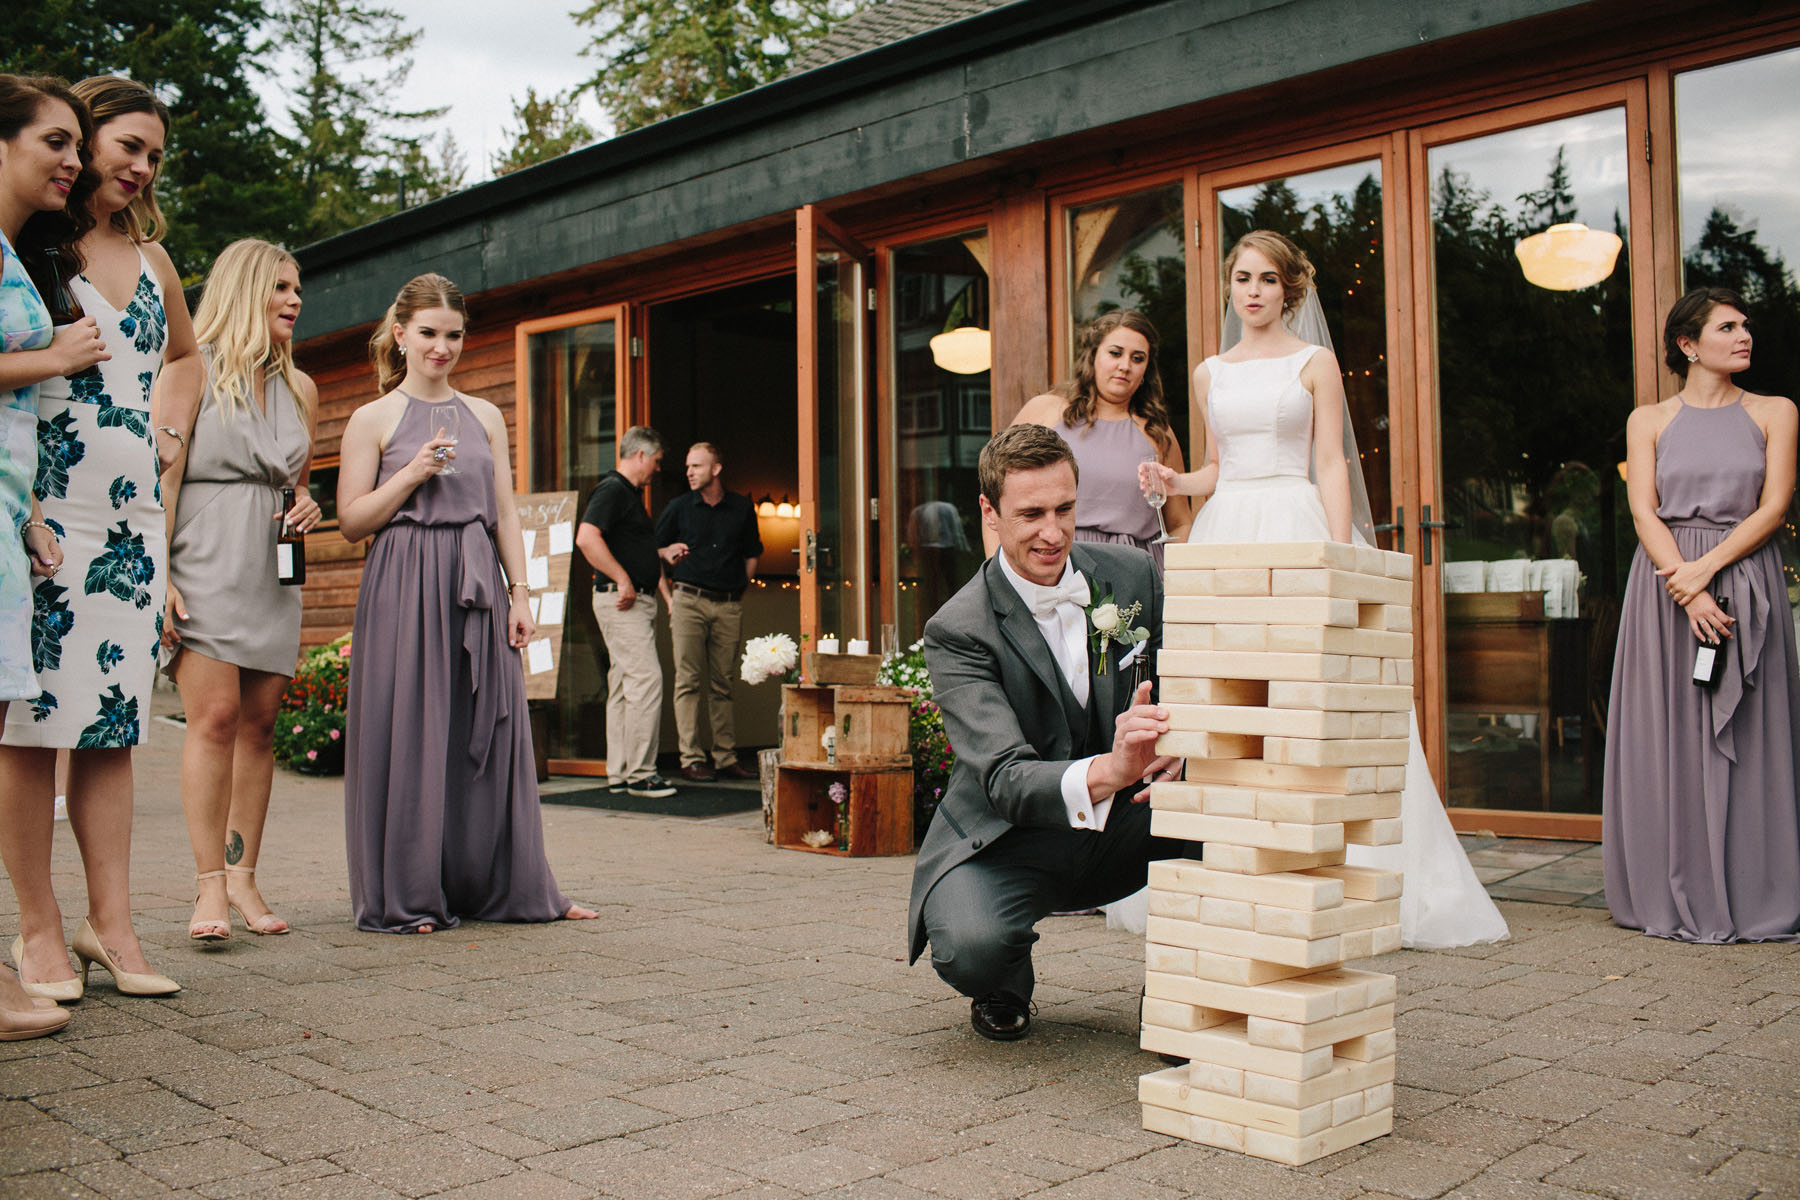 thetis-island-wedding-photographer-rp-rn-129.jpg